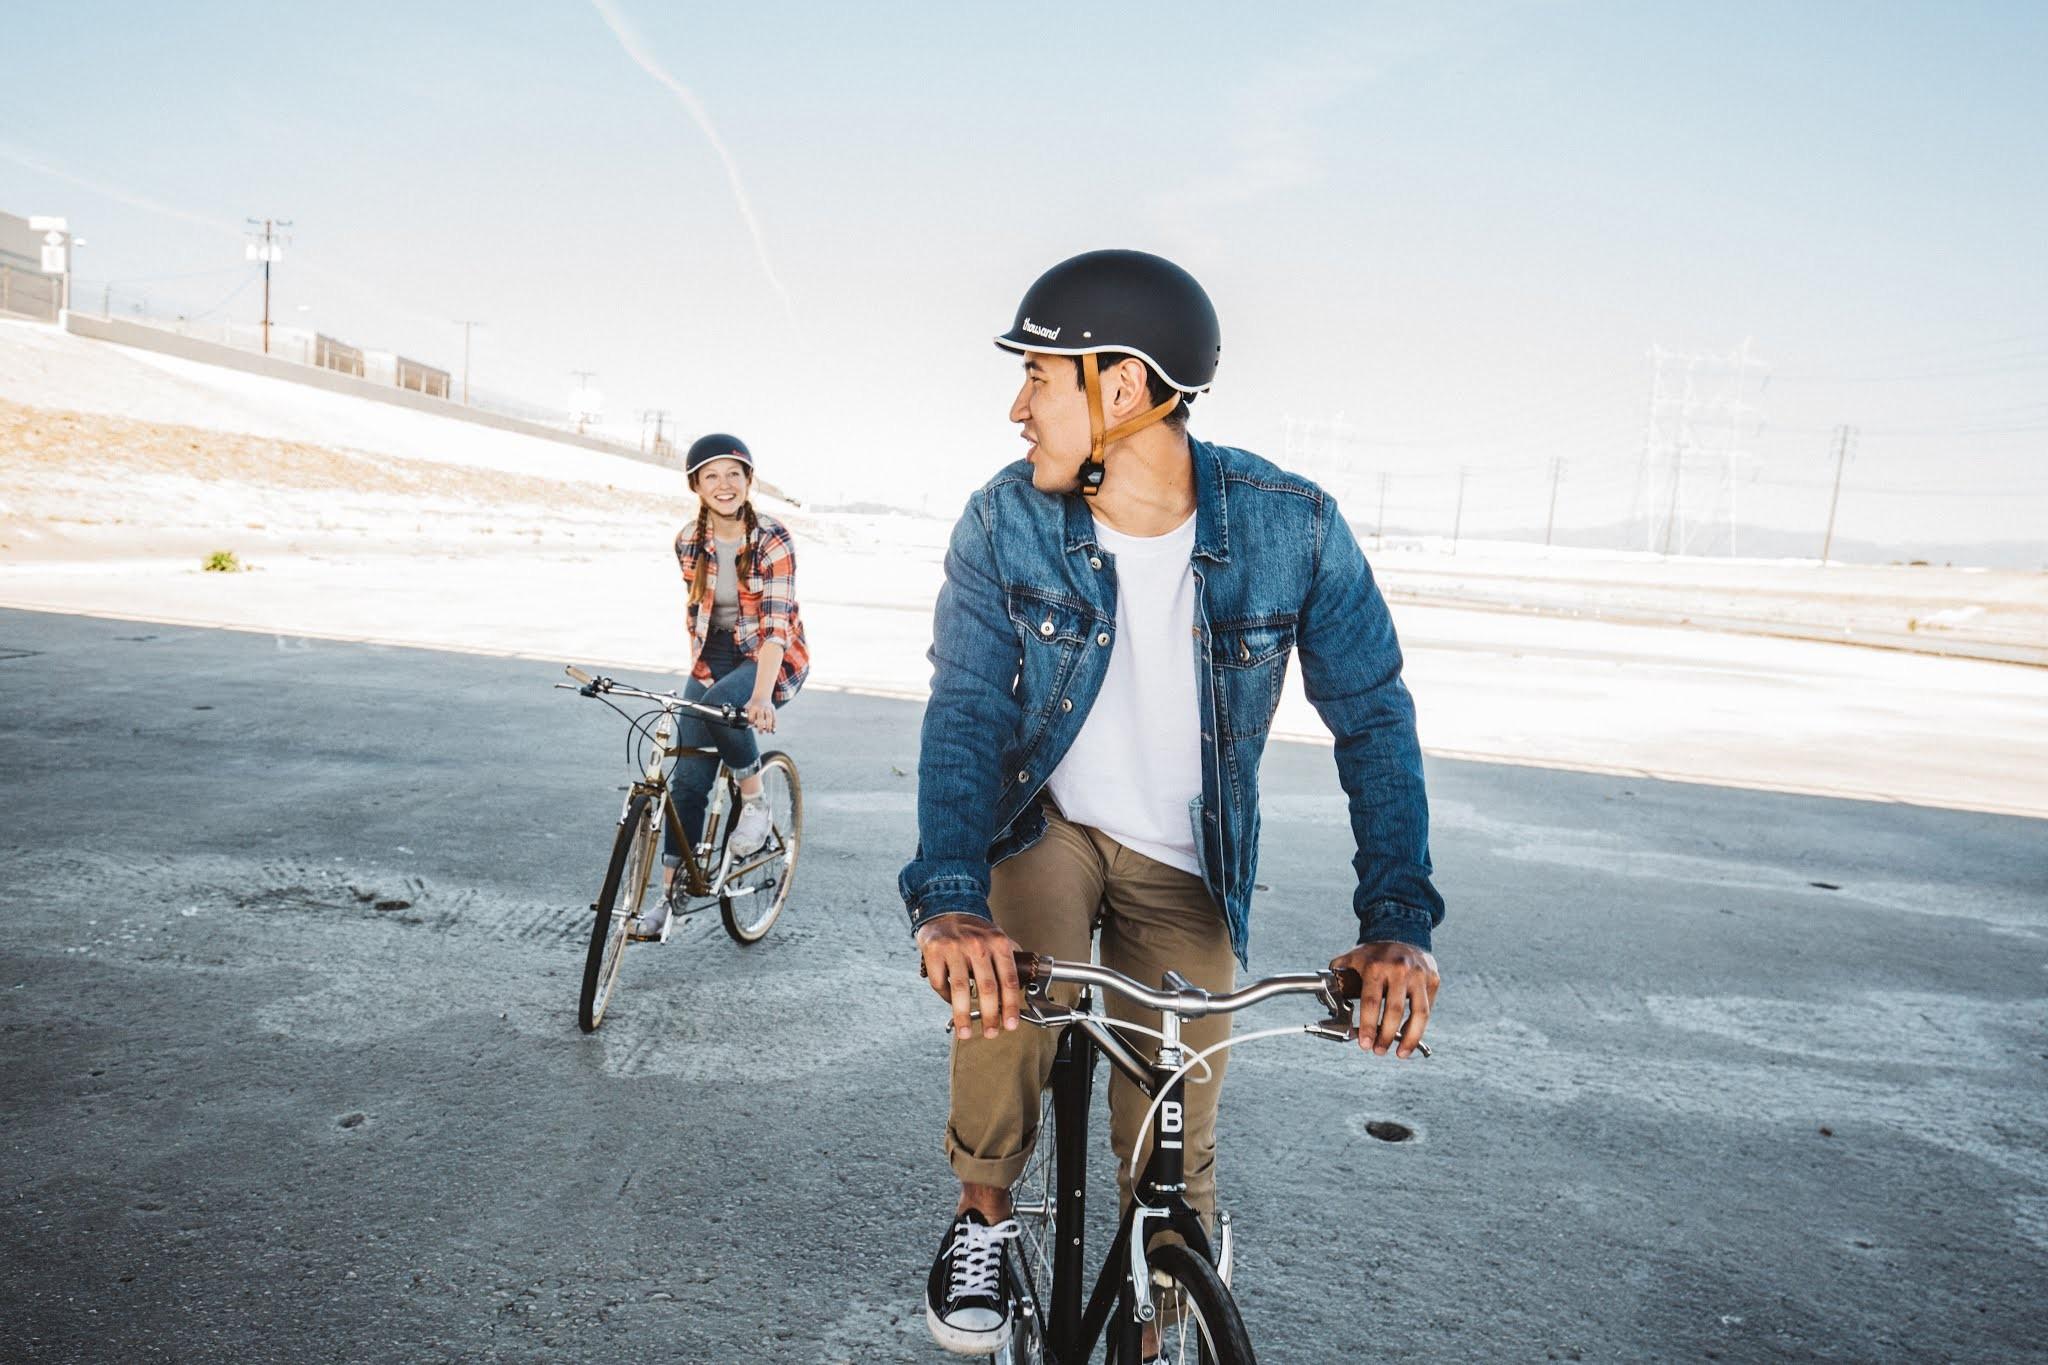 Thousand Epoch Fahrradhelm